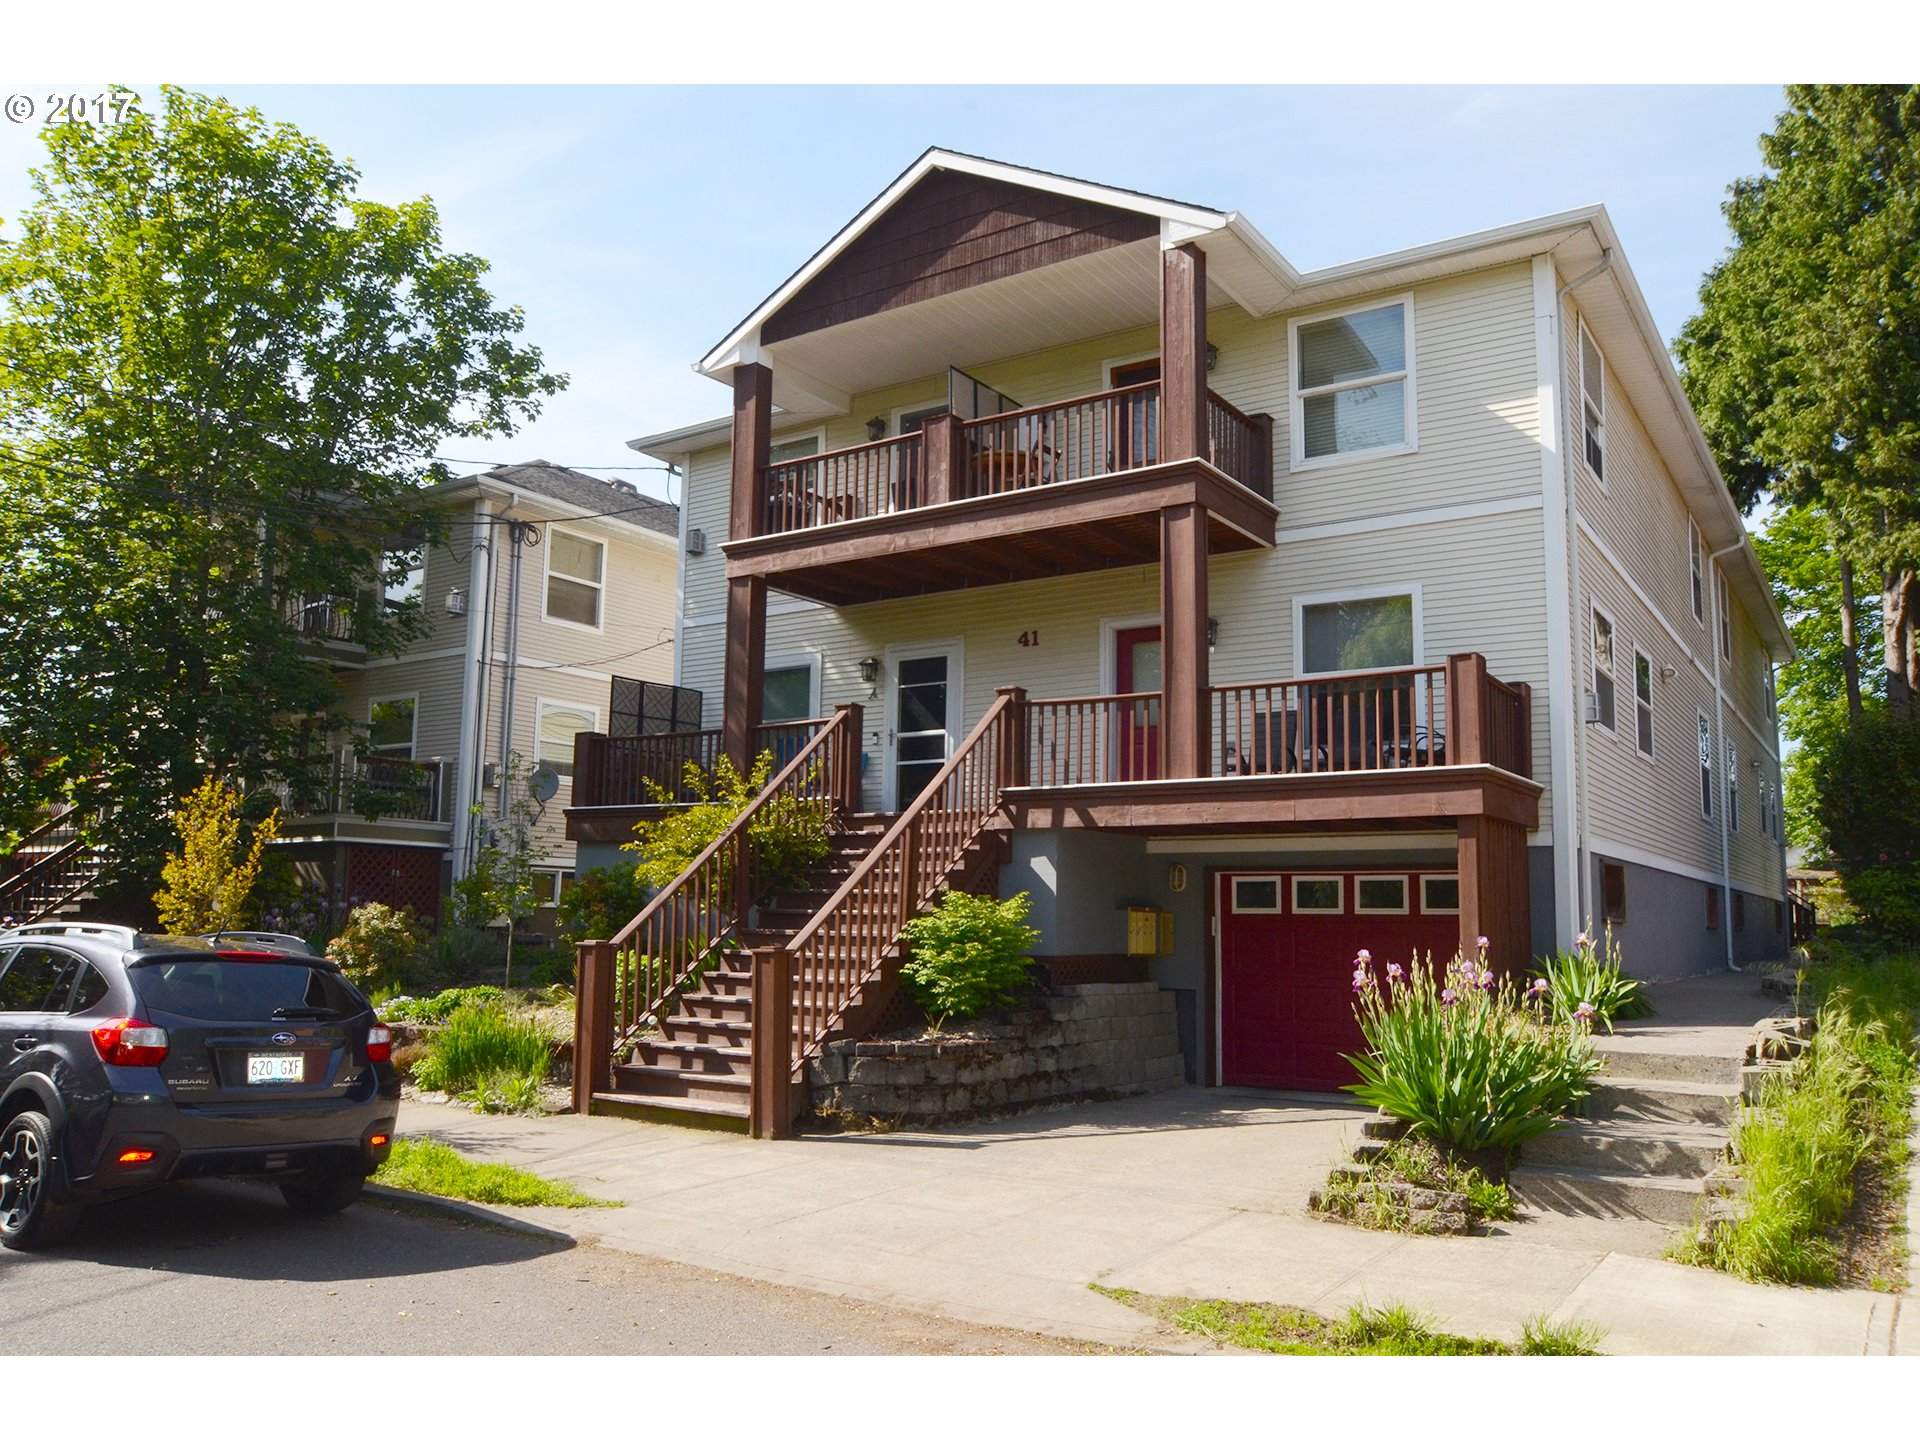 41 NE TILLAMOOK ST, Portland, OR 97212